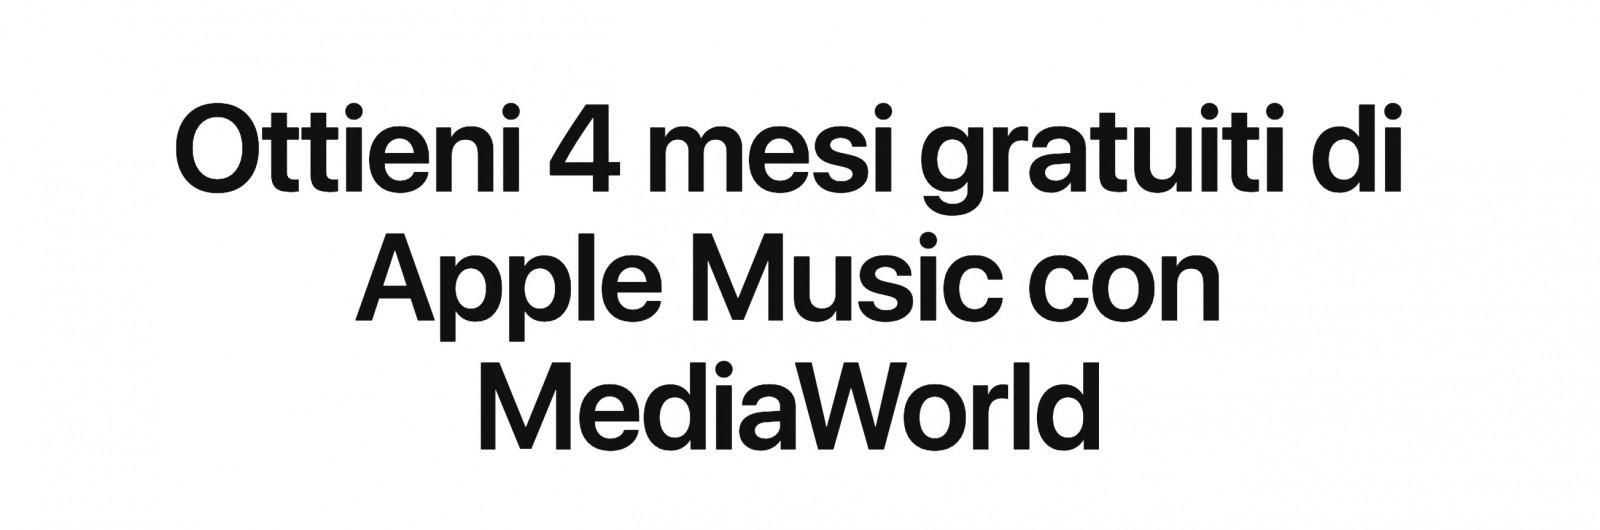 4 mesi gratis di Apple Music con MediaWorld